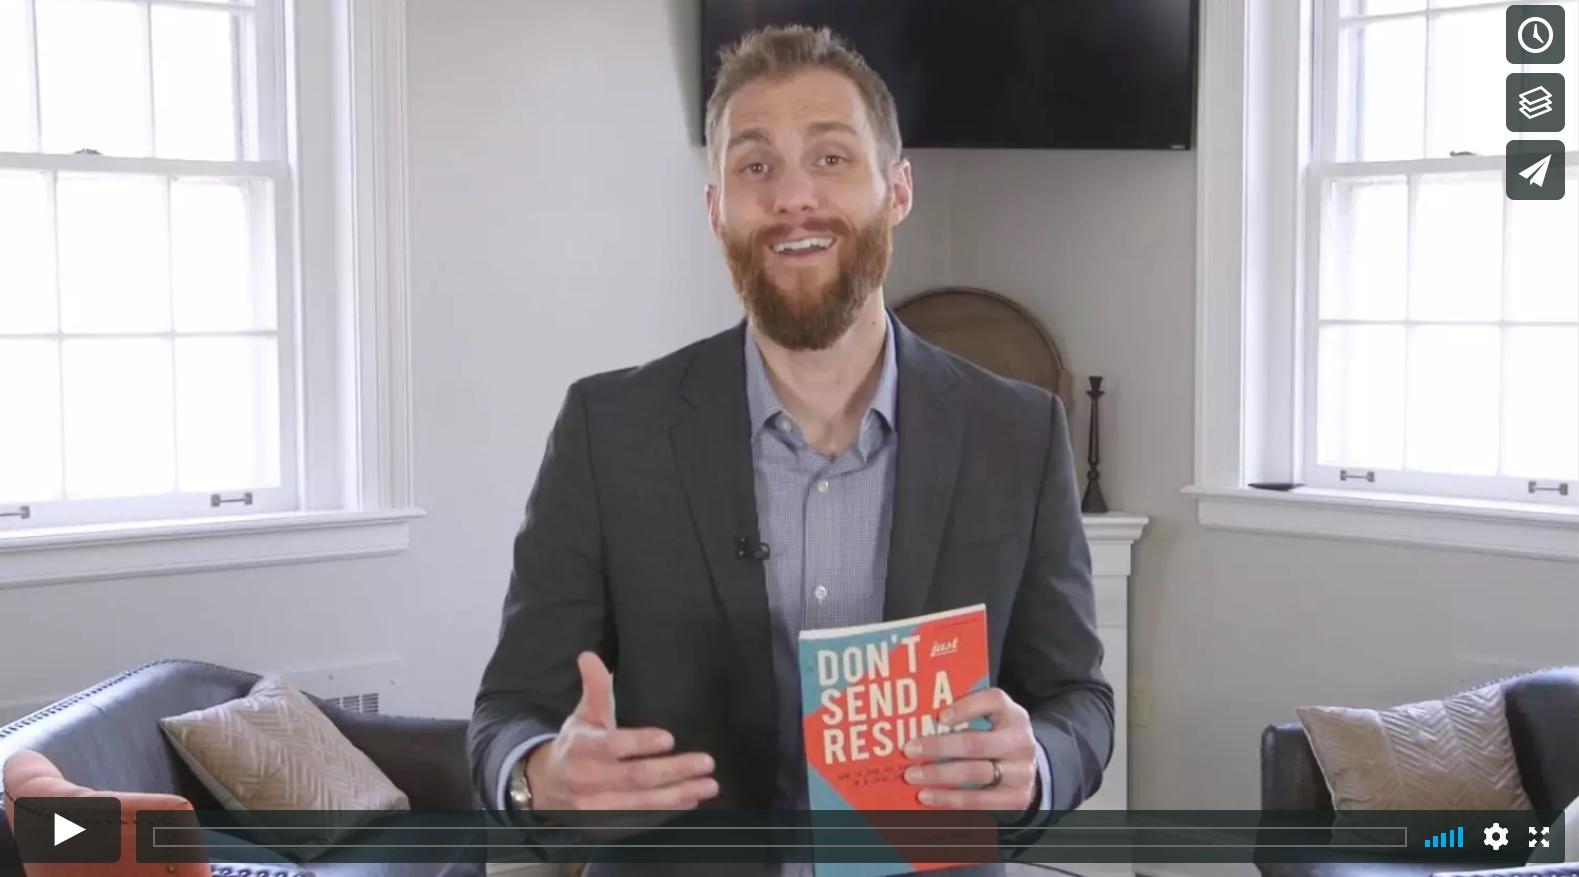 Kickstarter Video, Don't Just Send a Resume.jpg